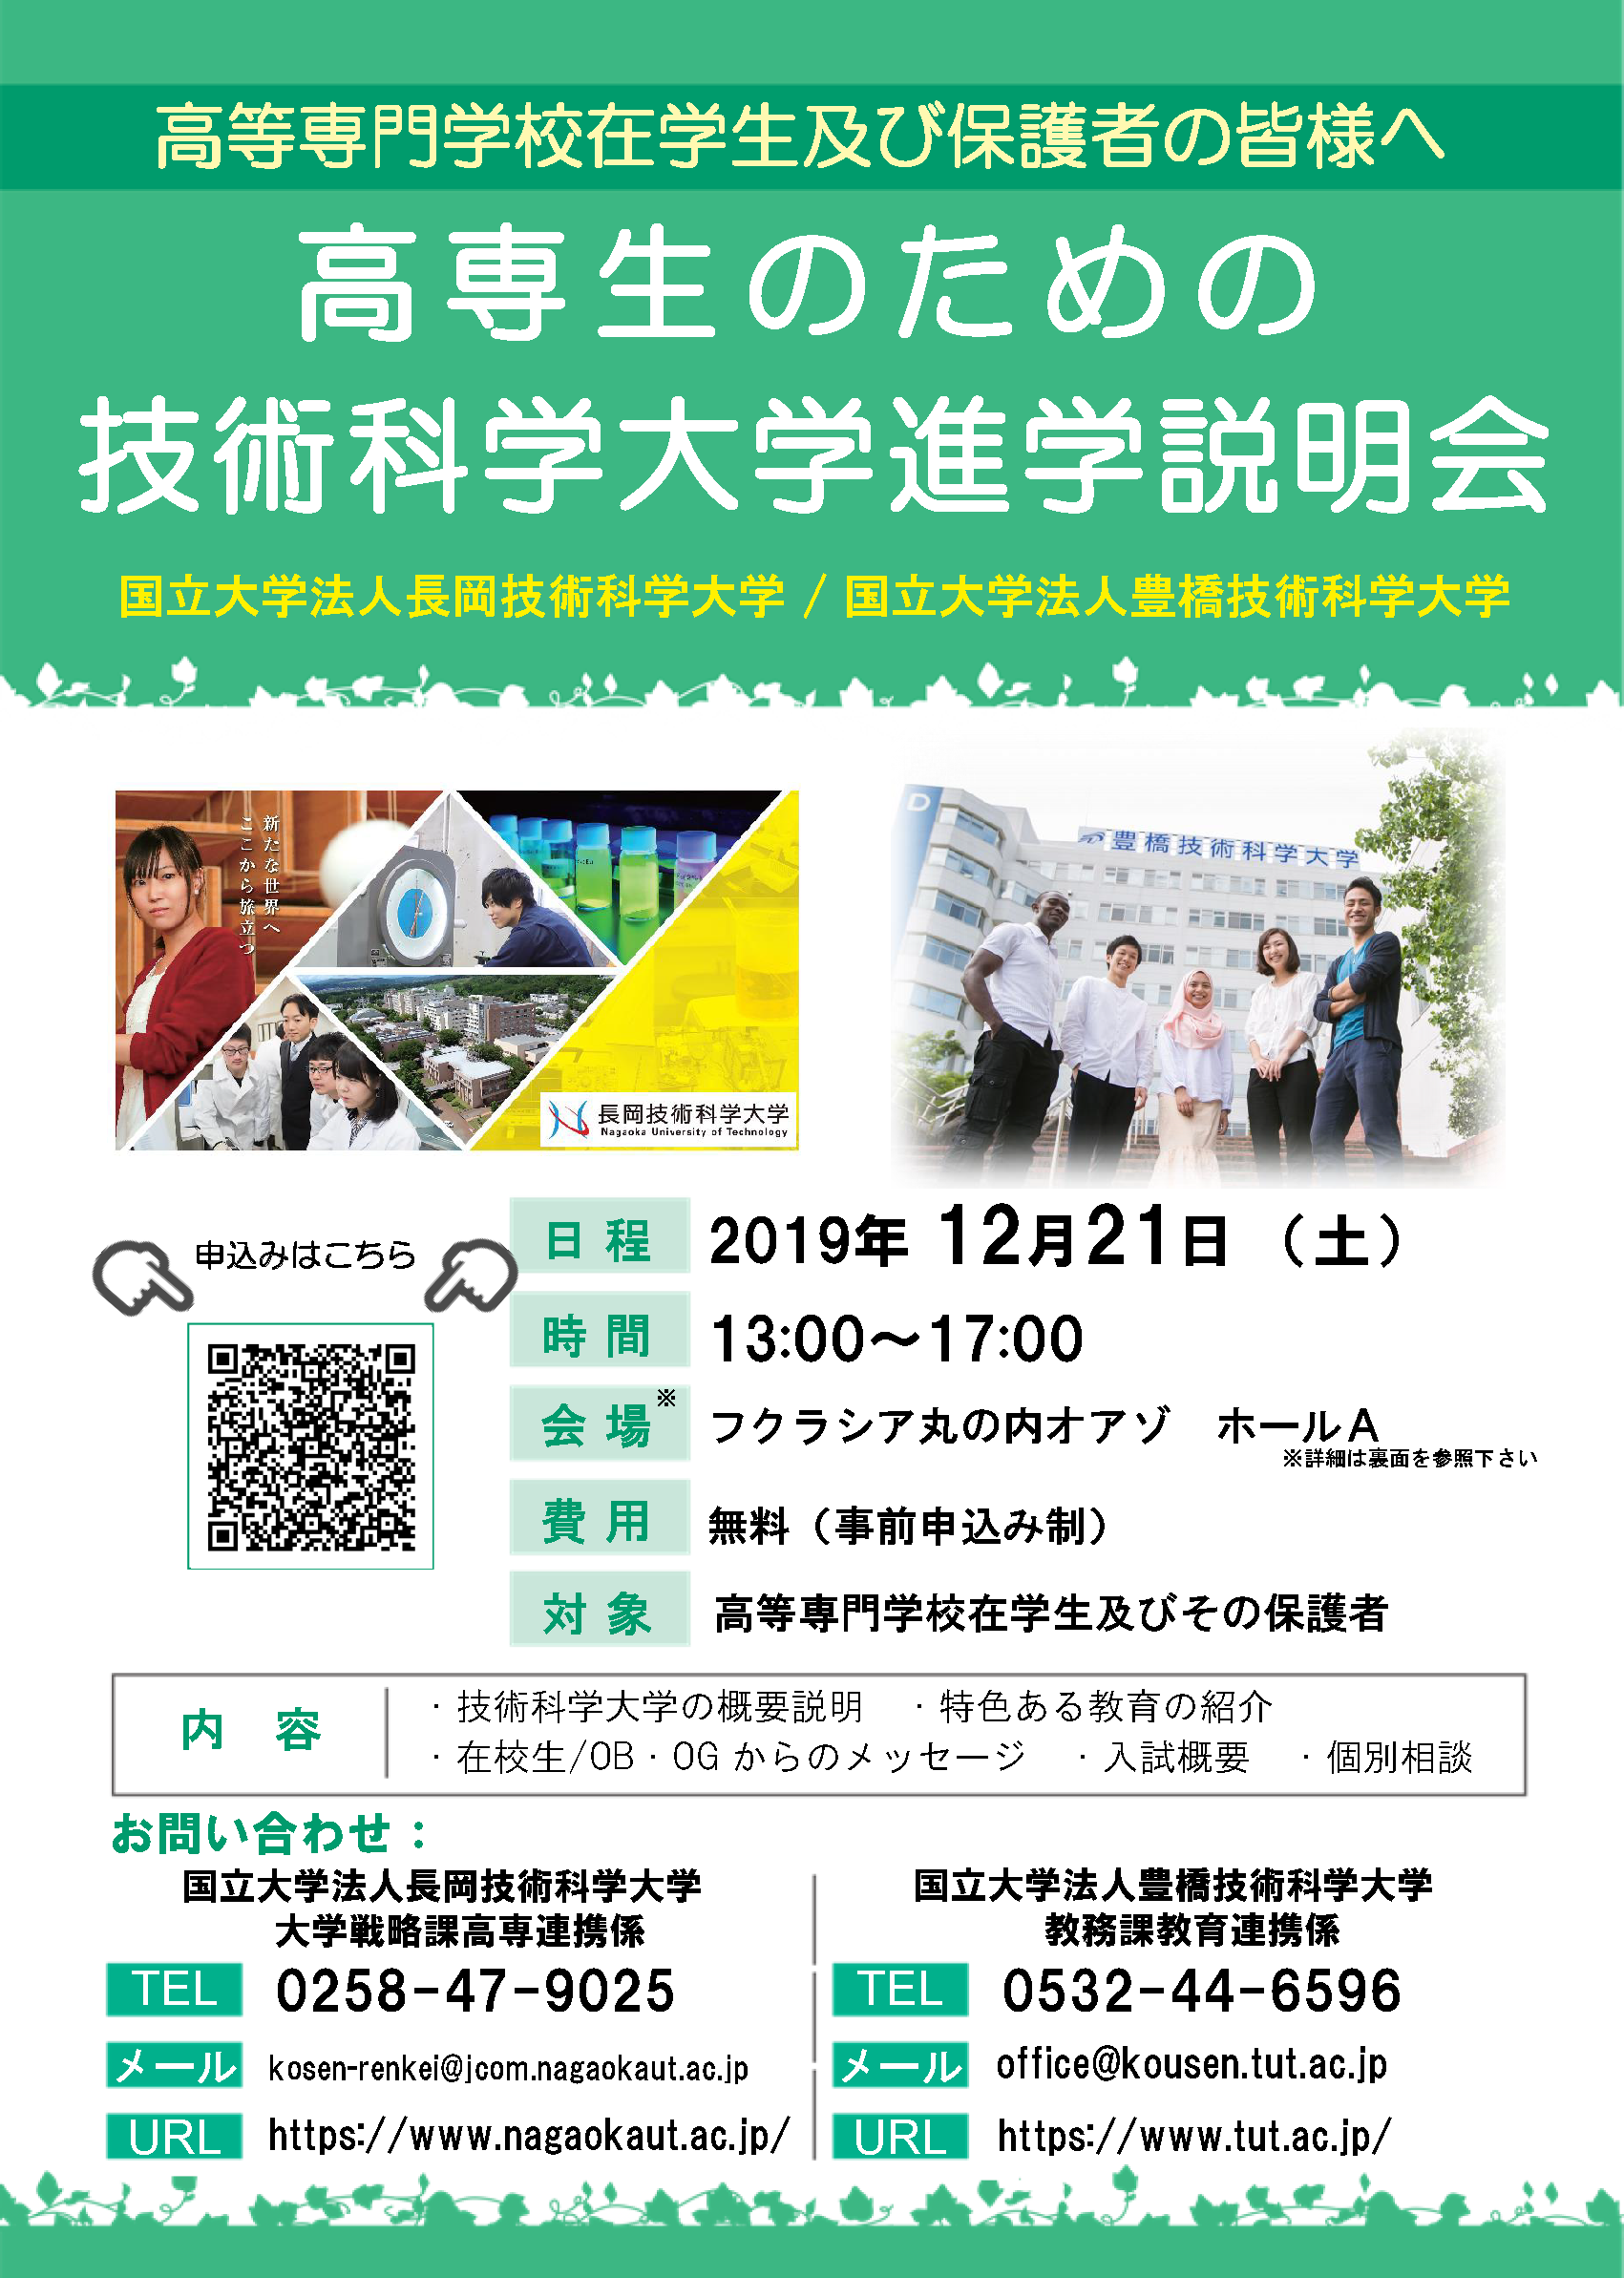 https://www.tut.ac.jp/event/images/191221ryougika.png